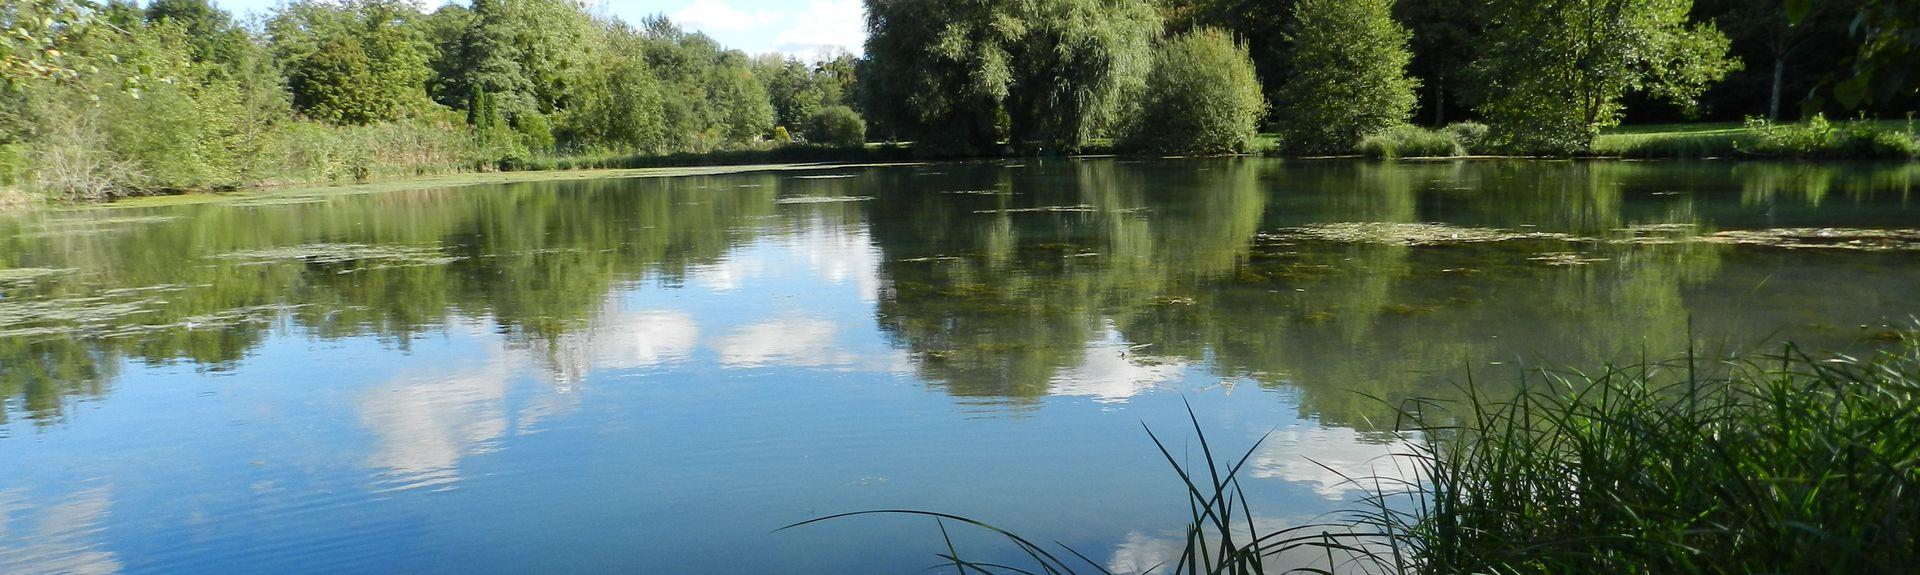 Poligny, Seine-et-Marne (departement), Frankrijk